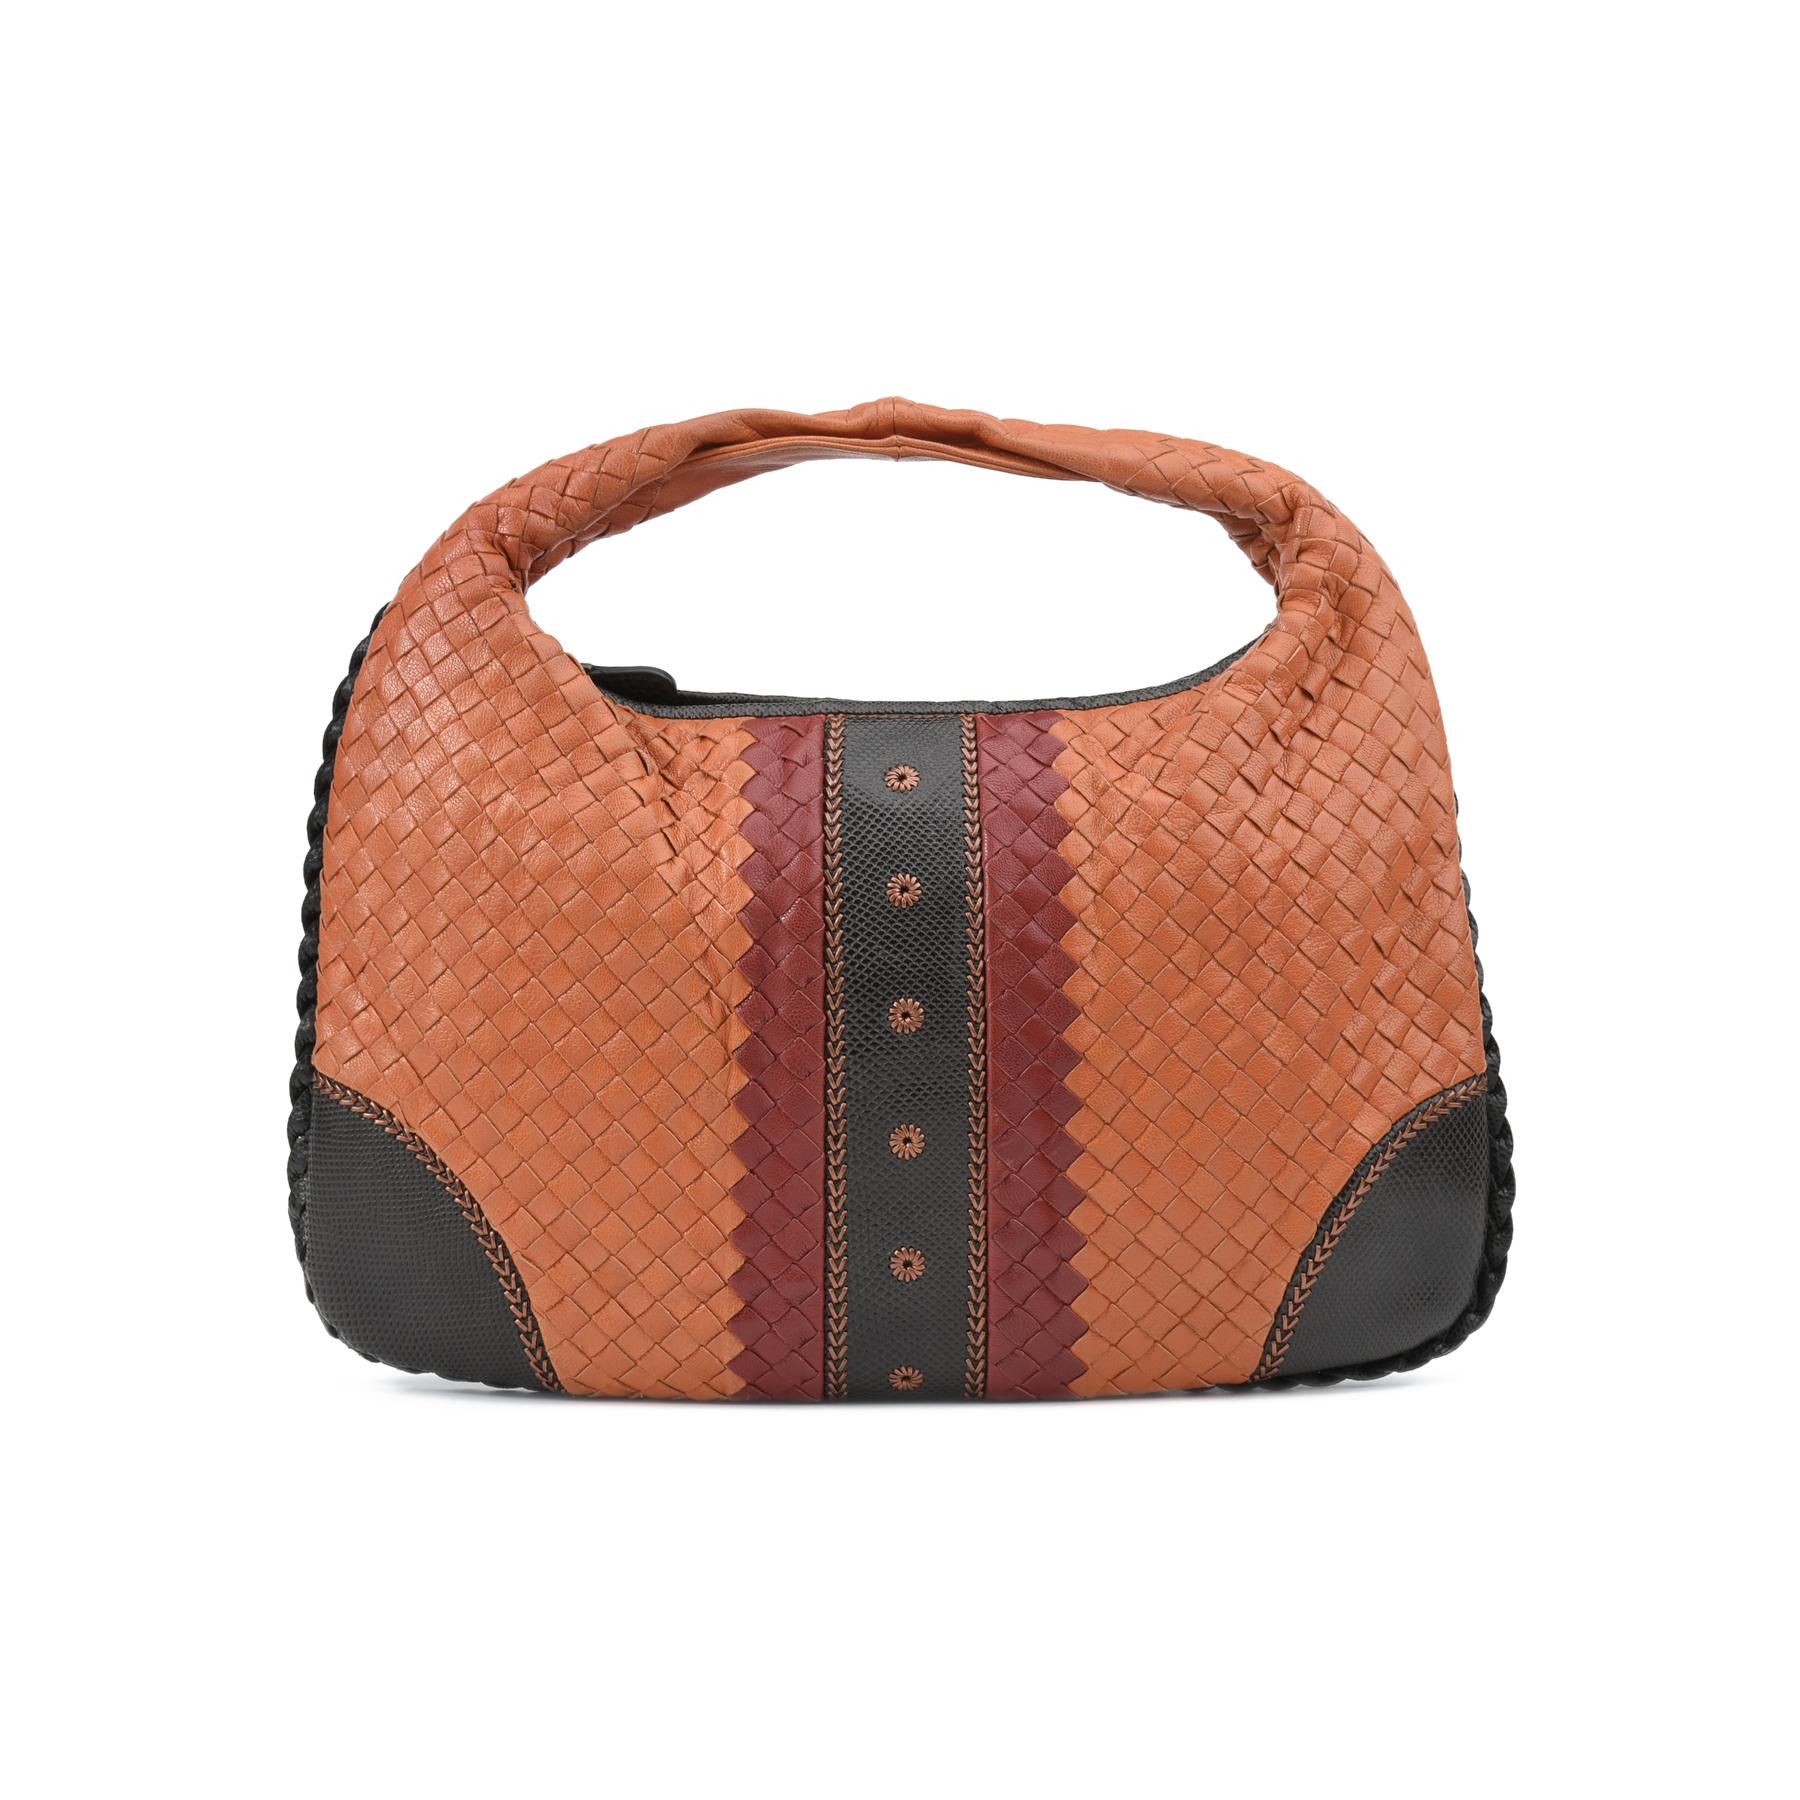 1bc67de0cbfd0 Authentic Second Hand Bottega Veneta Karung Trimmed Intrecciato Hobo Bag  (PSS-247-00073)